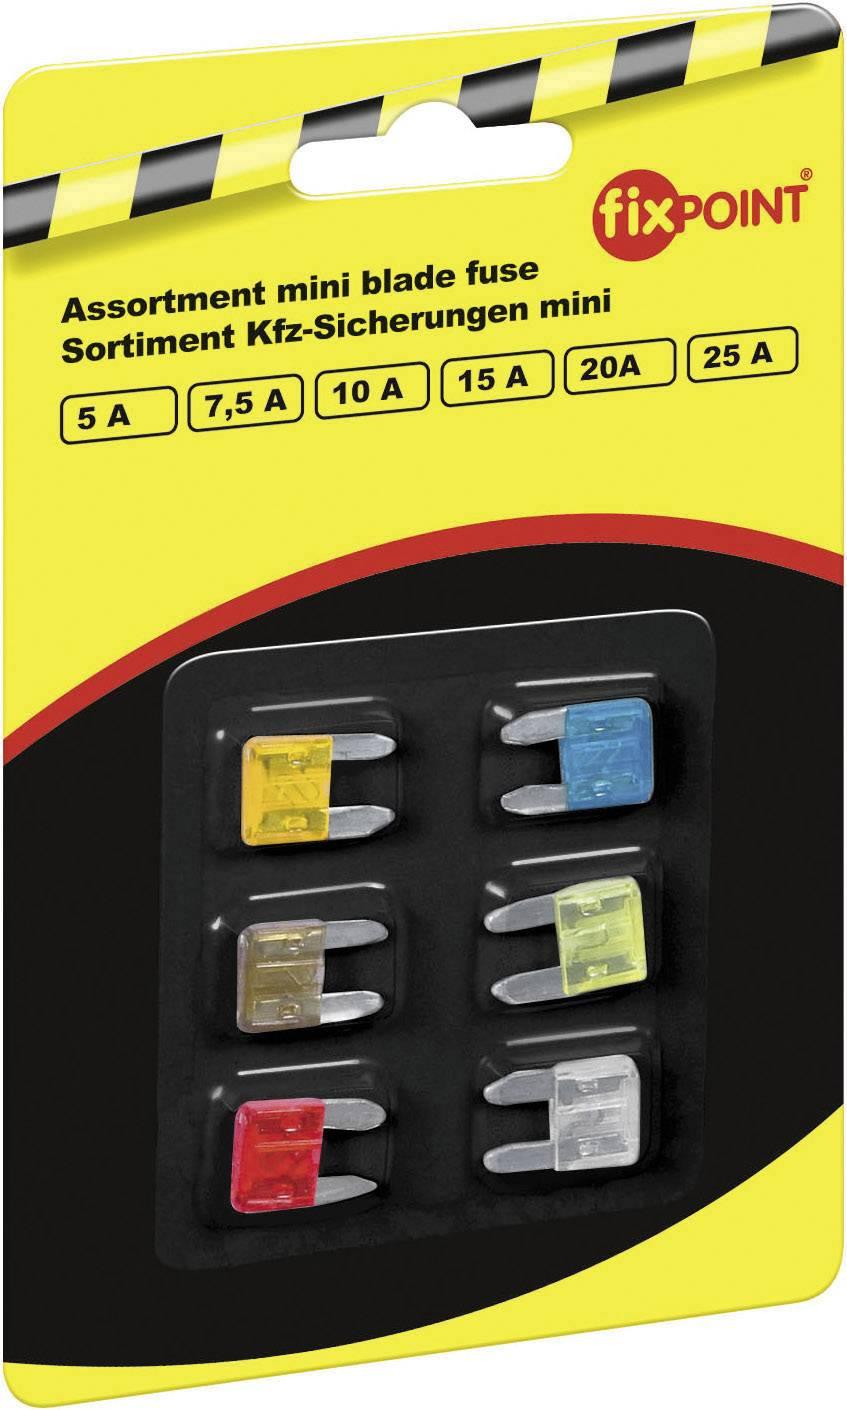 Sada miniaturních plochých autopojistek, 5 - 25 A, 6 ks